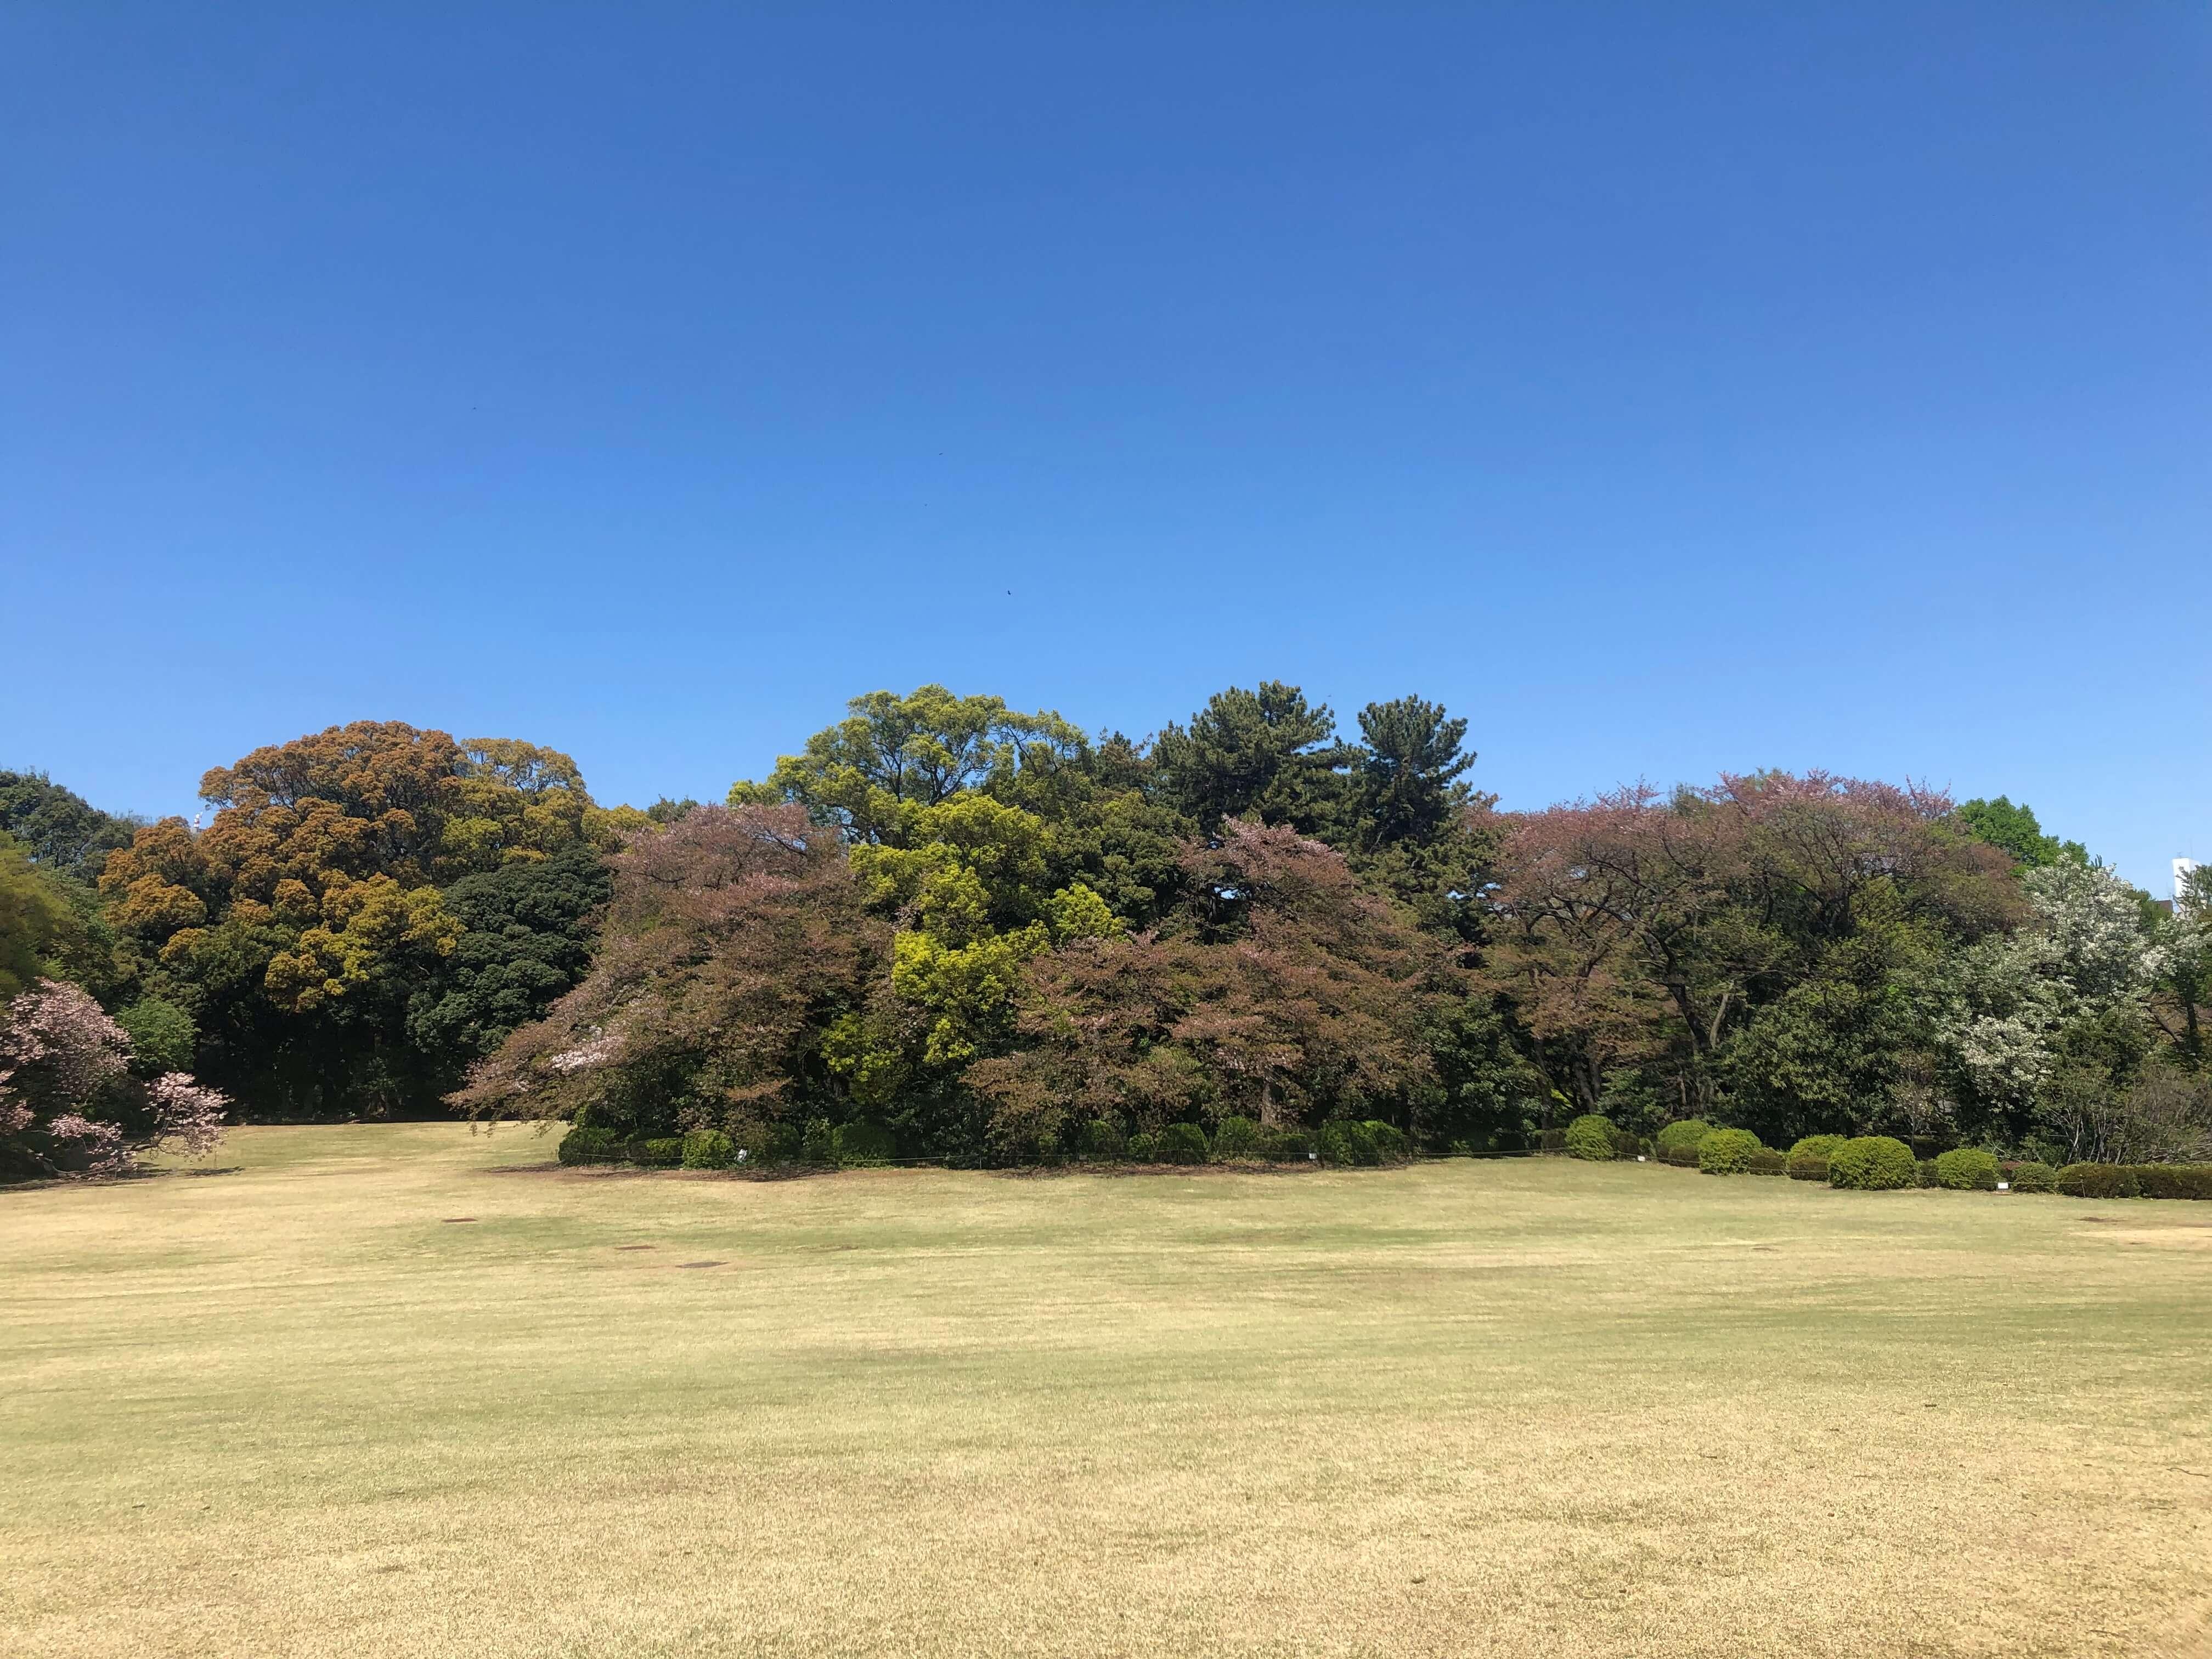 COTON 浜町・人形町 Hanare予約状況※4/24(水)更新